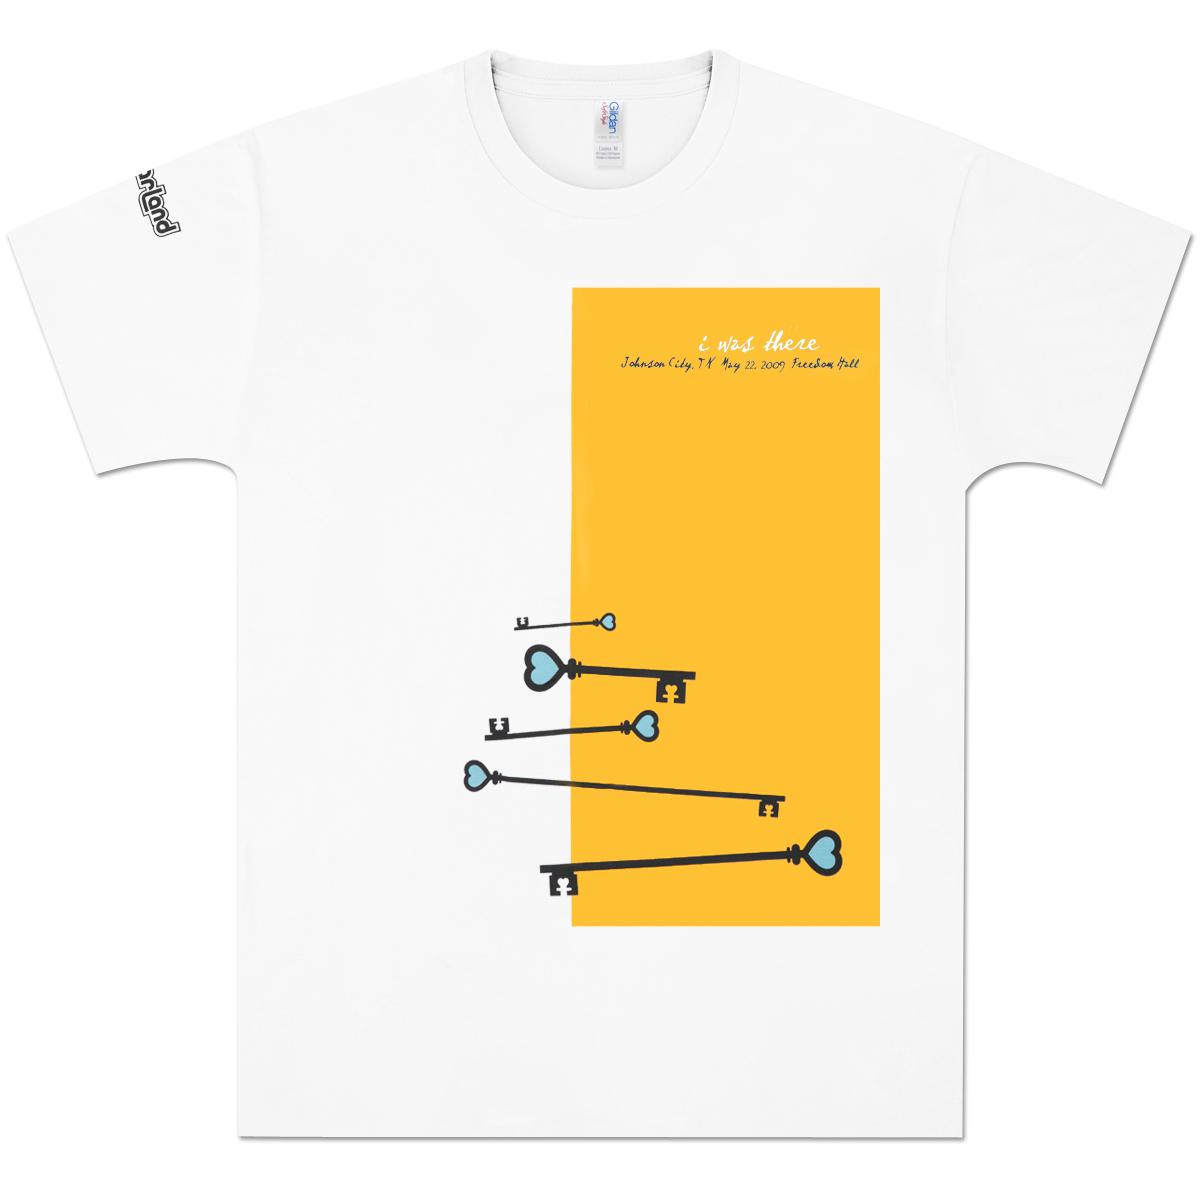 Sugarland Johnson City, TN Event T-Shirt